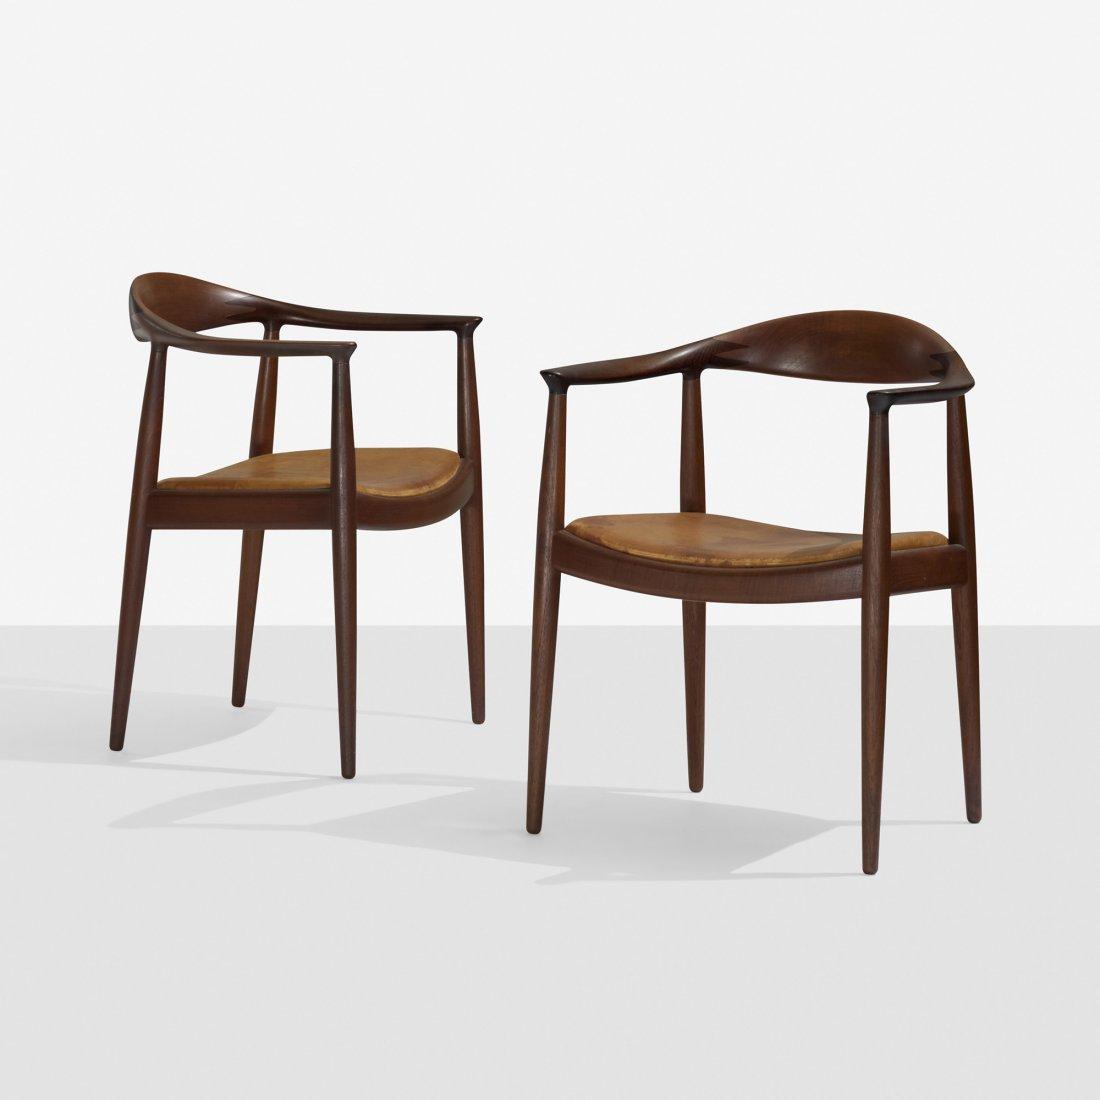 114: Hans Wegner The Chairs, pair